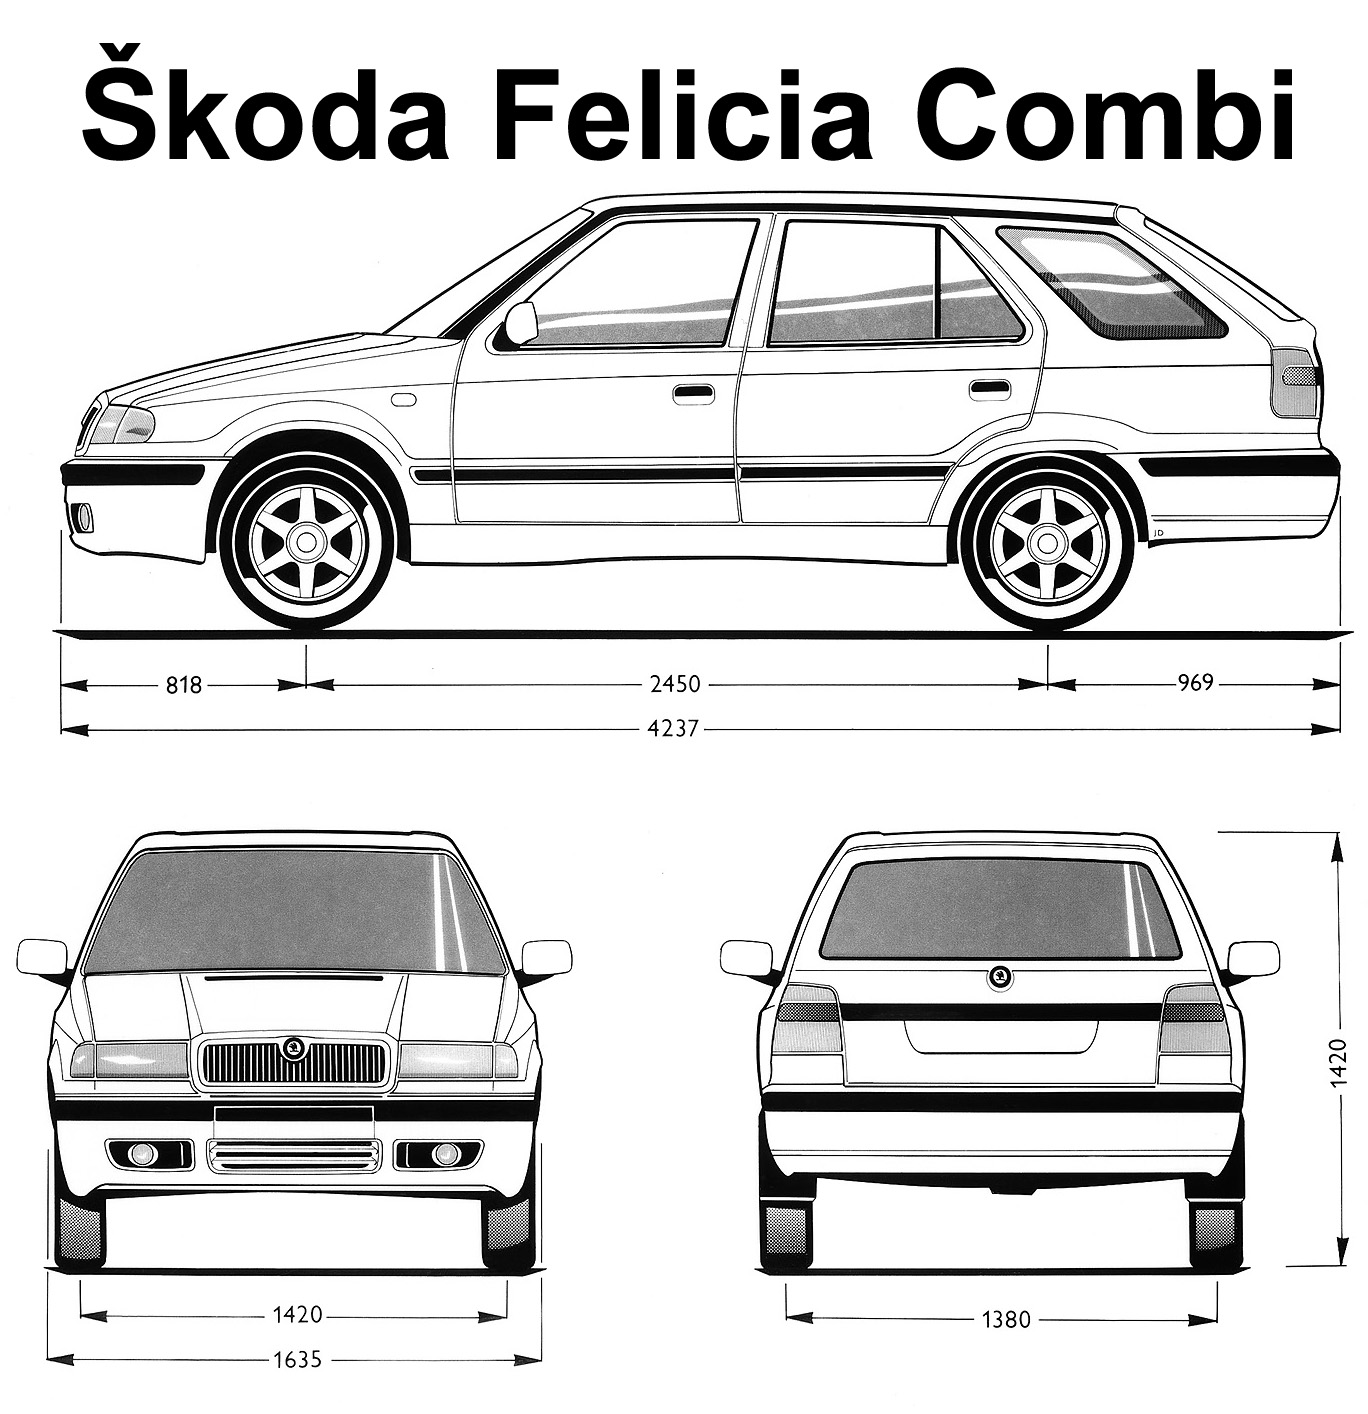 Skoda Felicia I Restyling 1998 - 2001 Station wagon 5 door #1